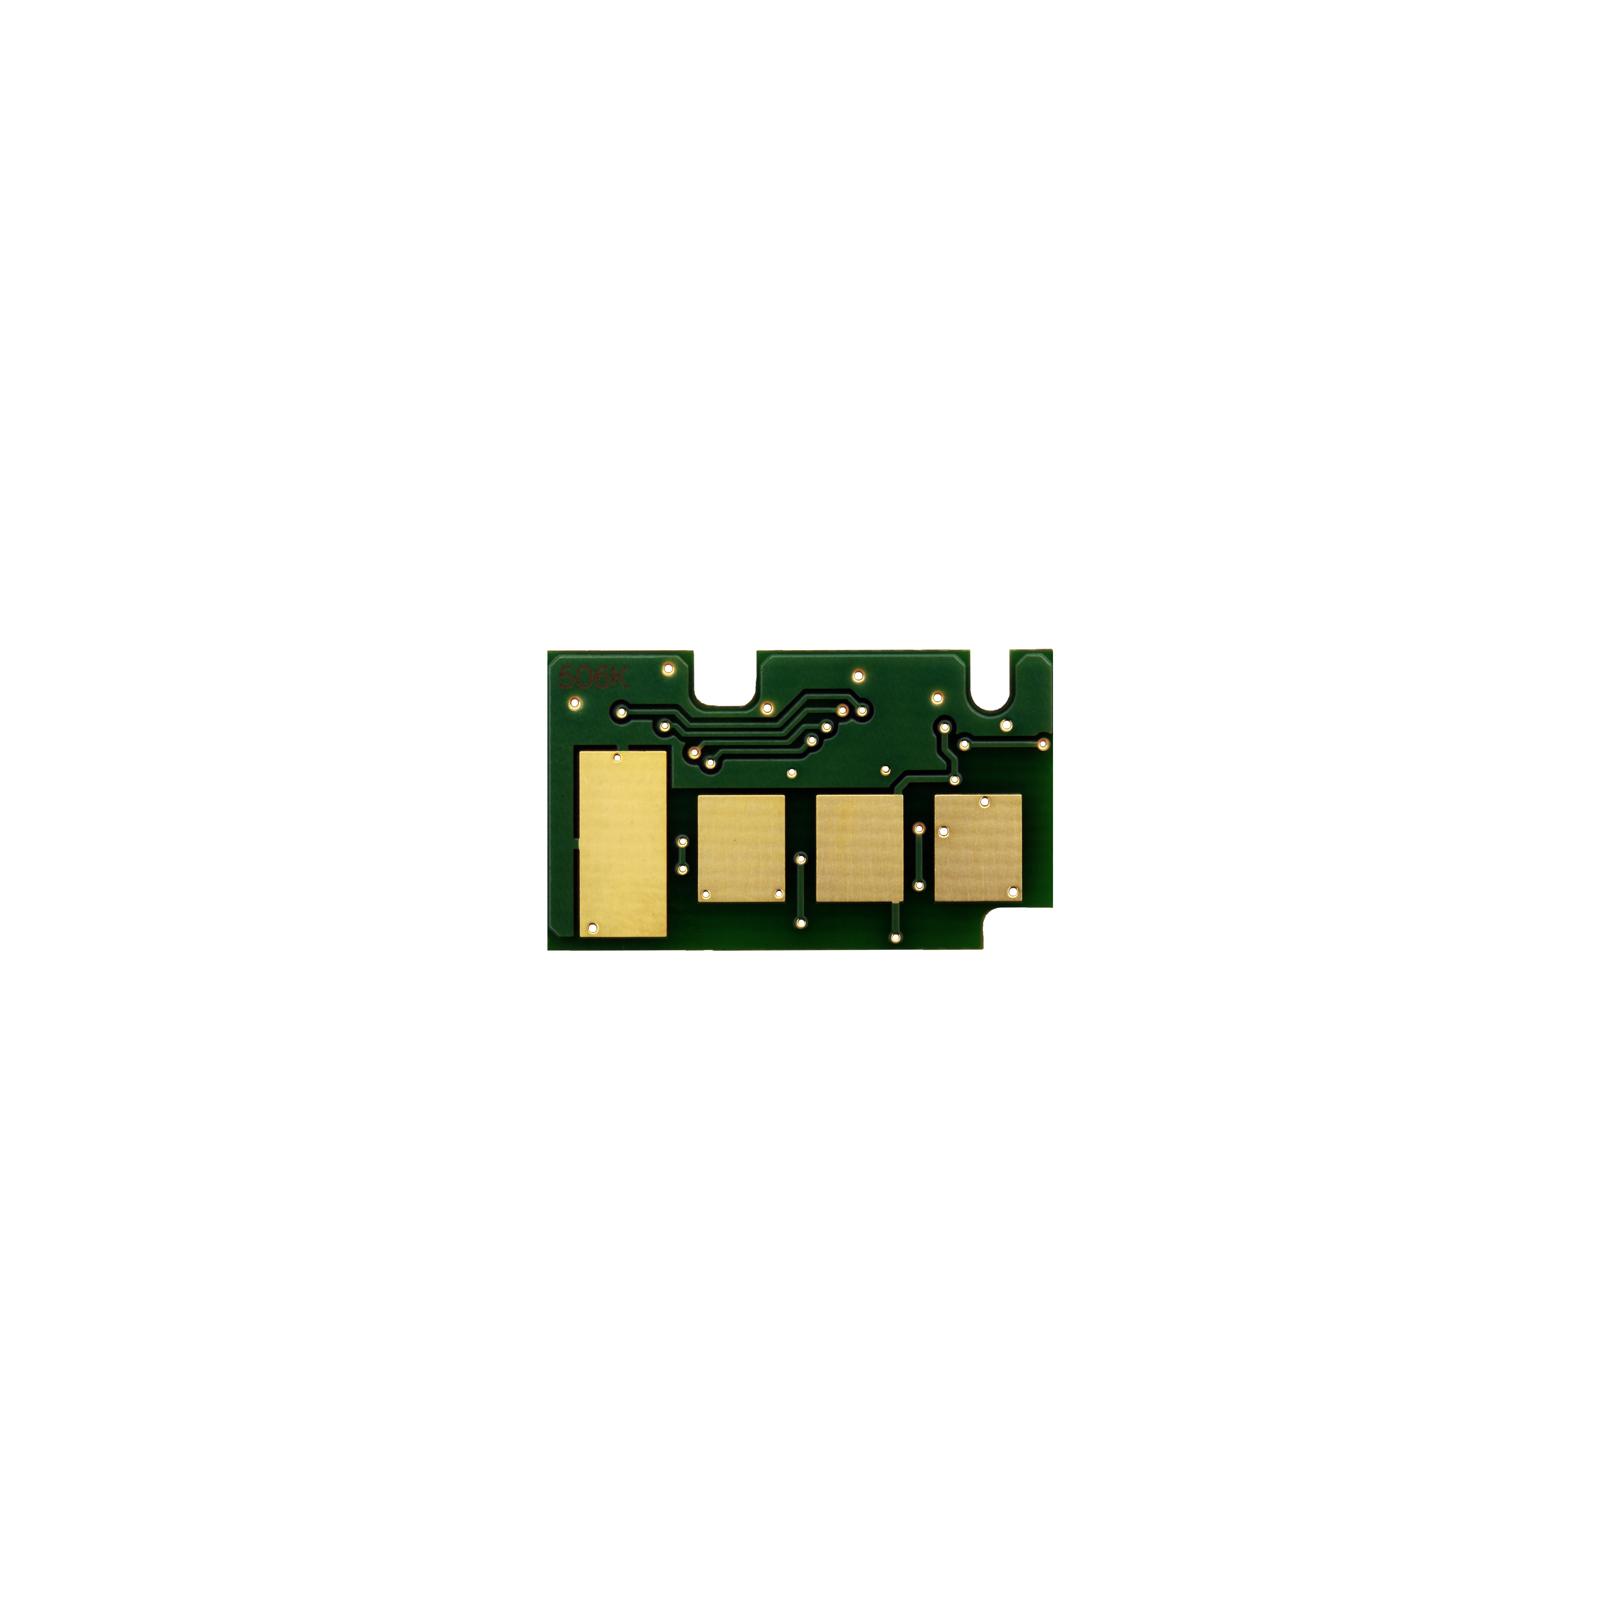 Чип для картриджа SamsungCLX-6260 (CLT-M506L/ELS) 3.5k magenta Static Control (SAM506CHIP-MAEU)